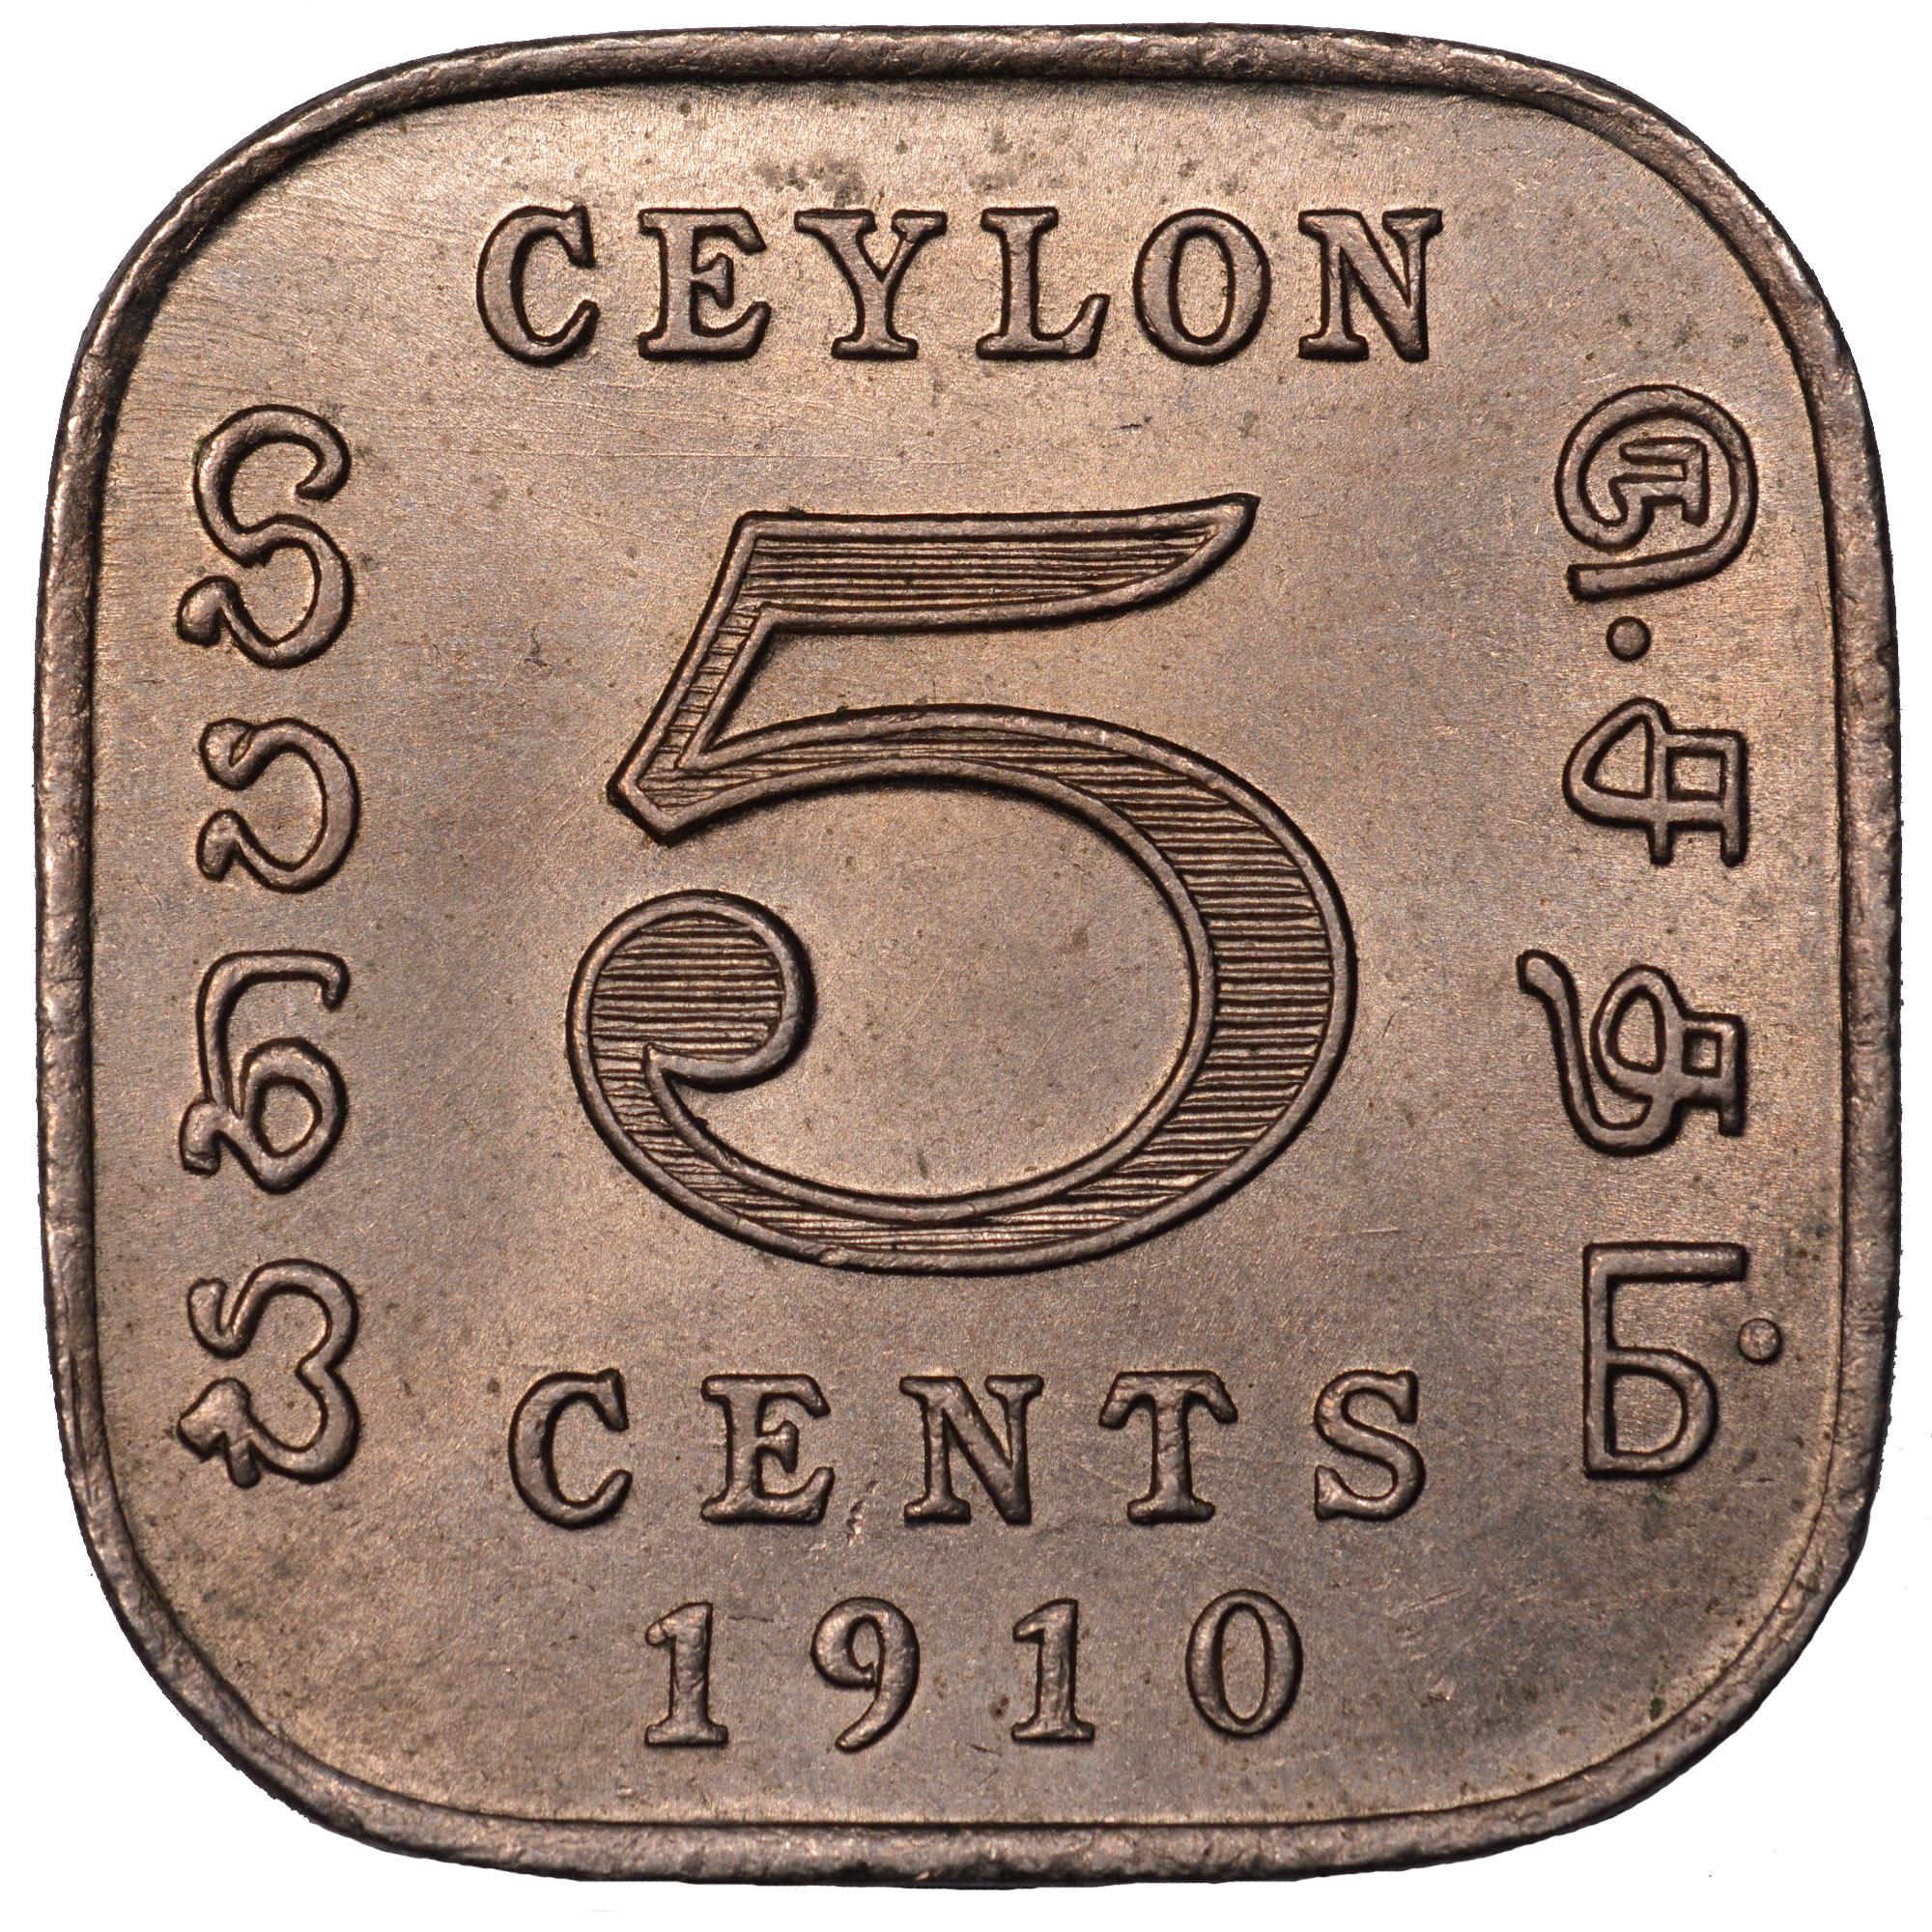 1909-1910 Ceylon 5 Cents reverse